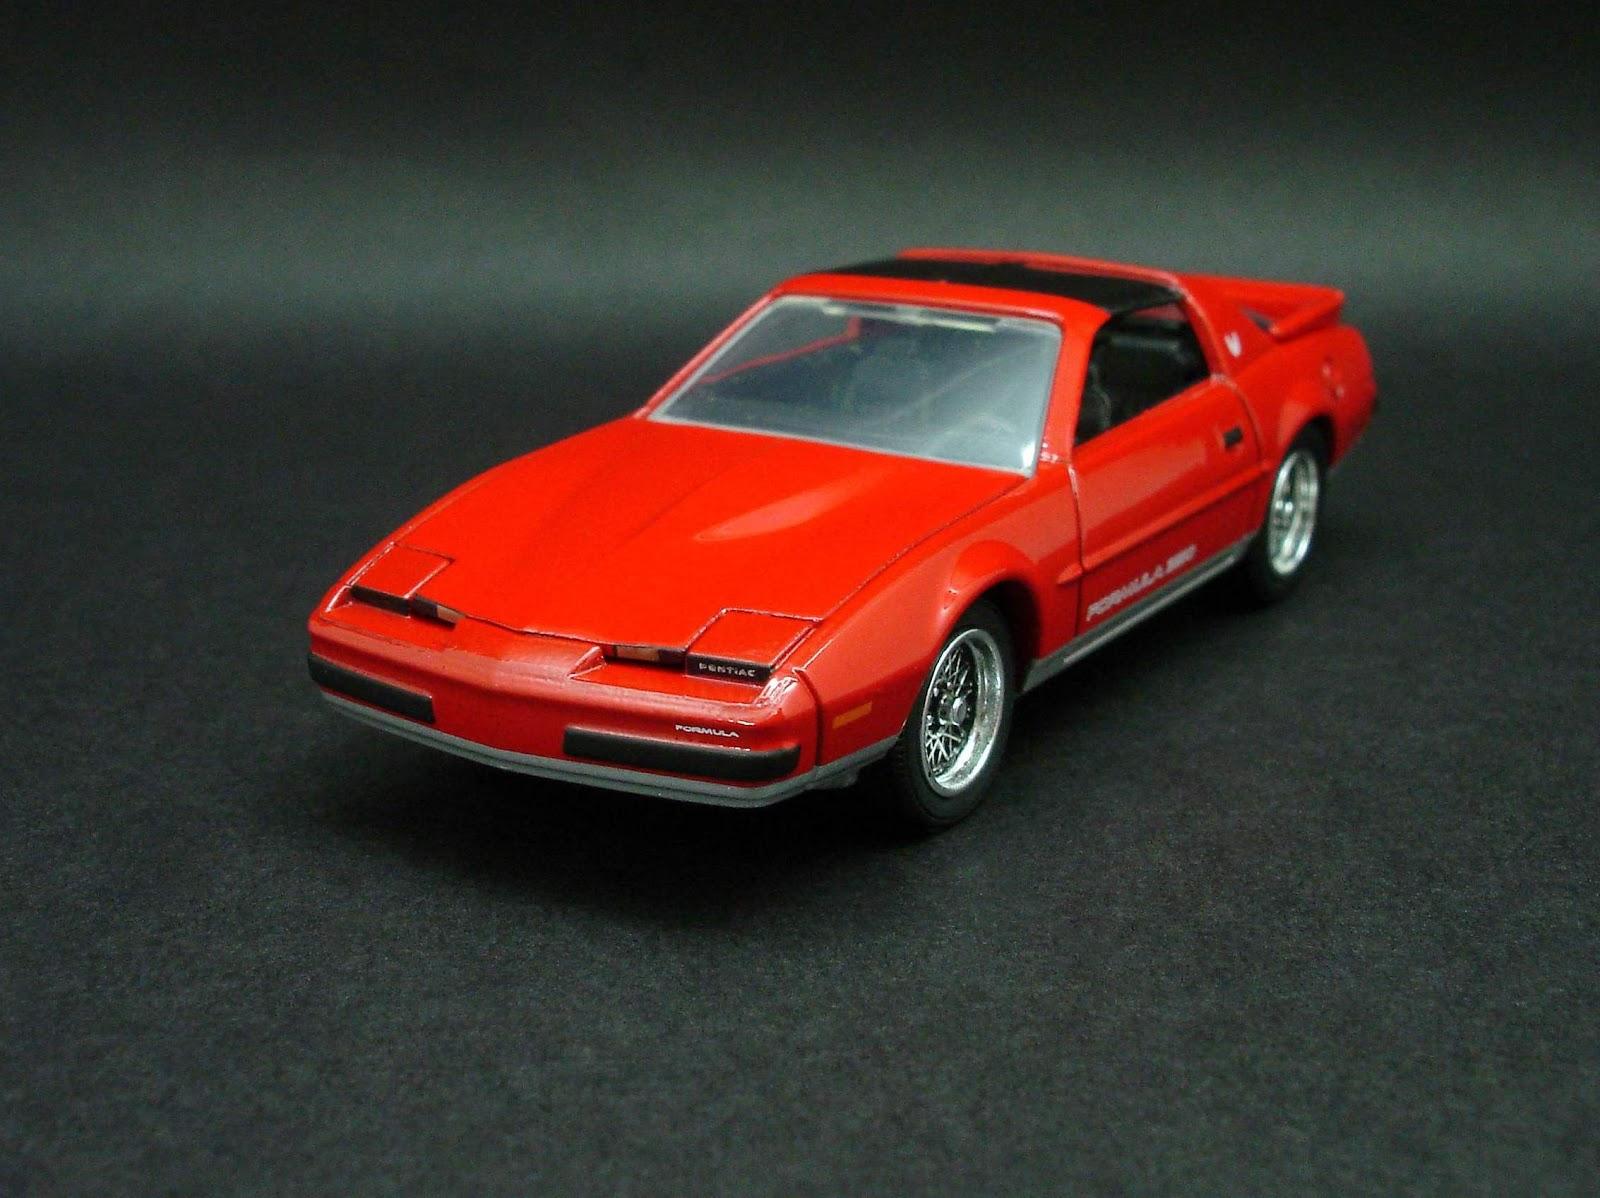 diecast hobbist 1989 pontiac firebird formula 350. Black Bedroom Furniture Sets. Home Design Ideas